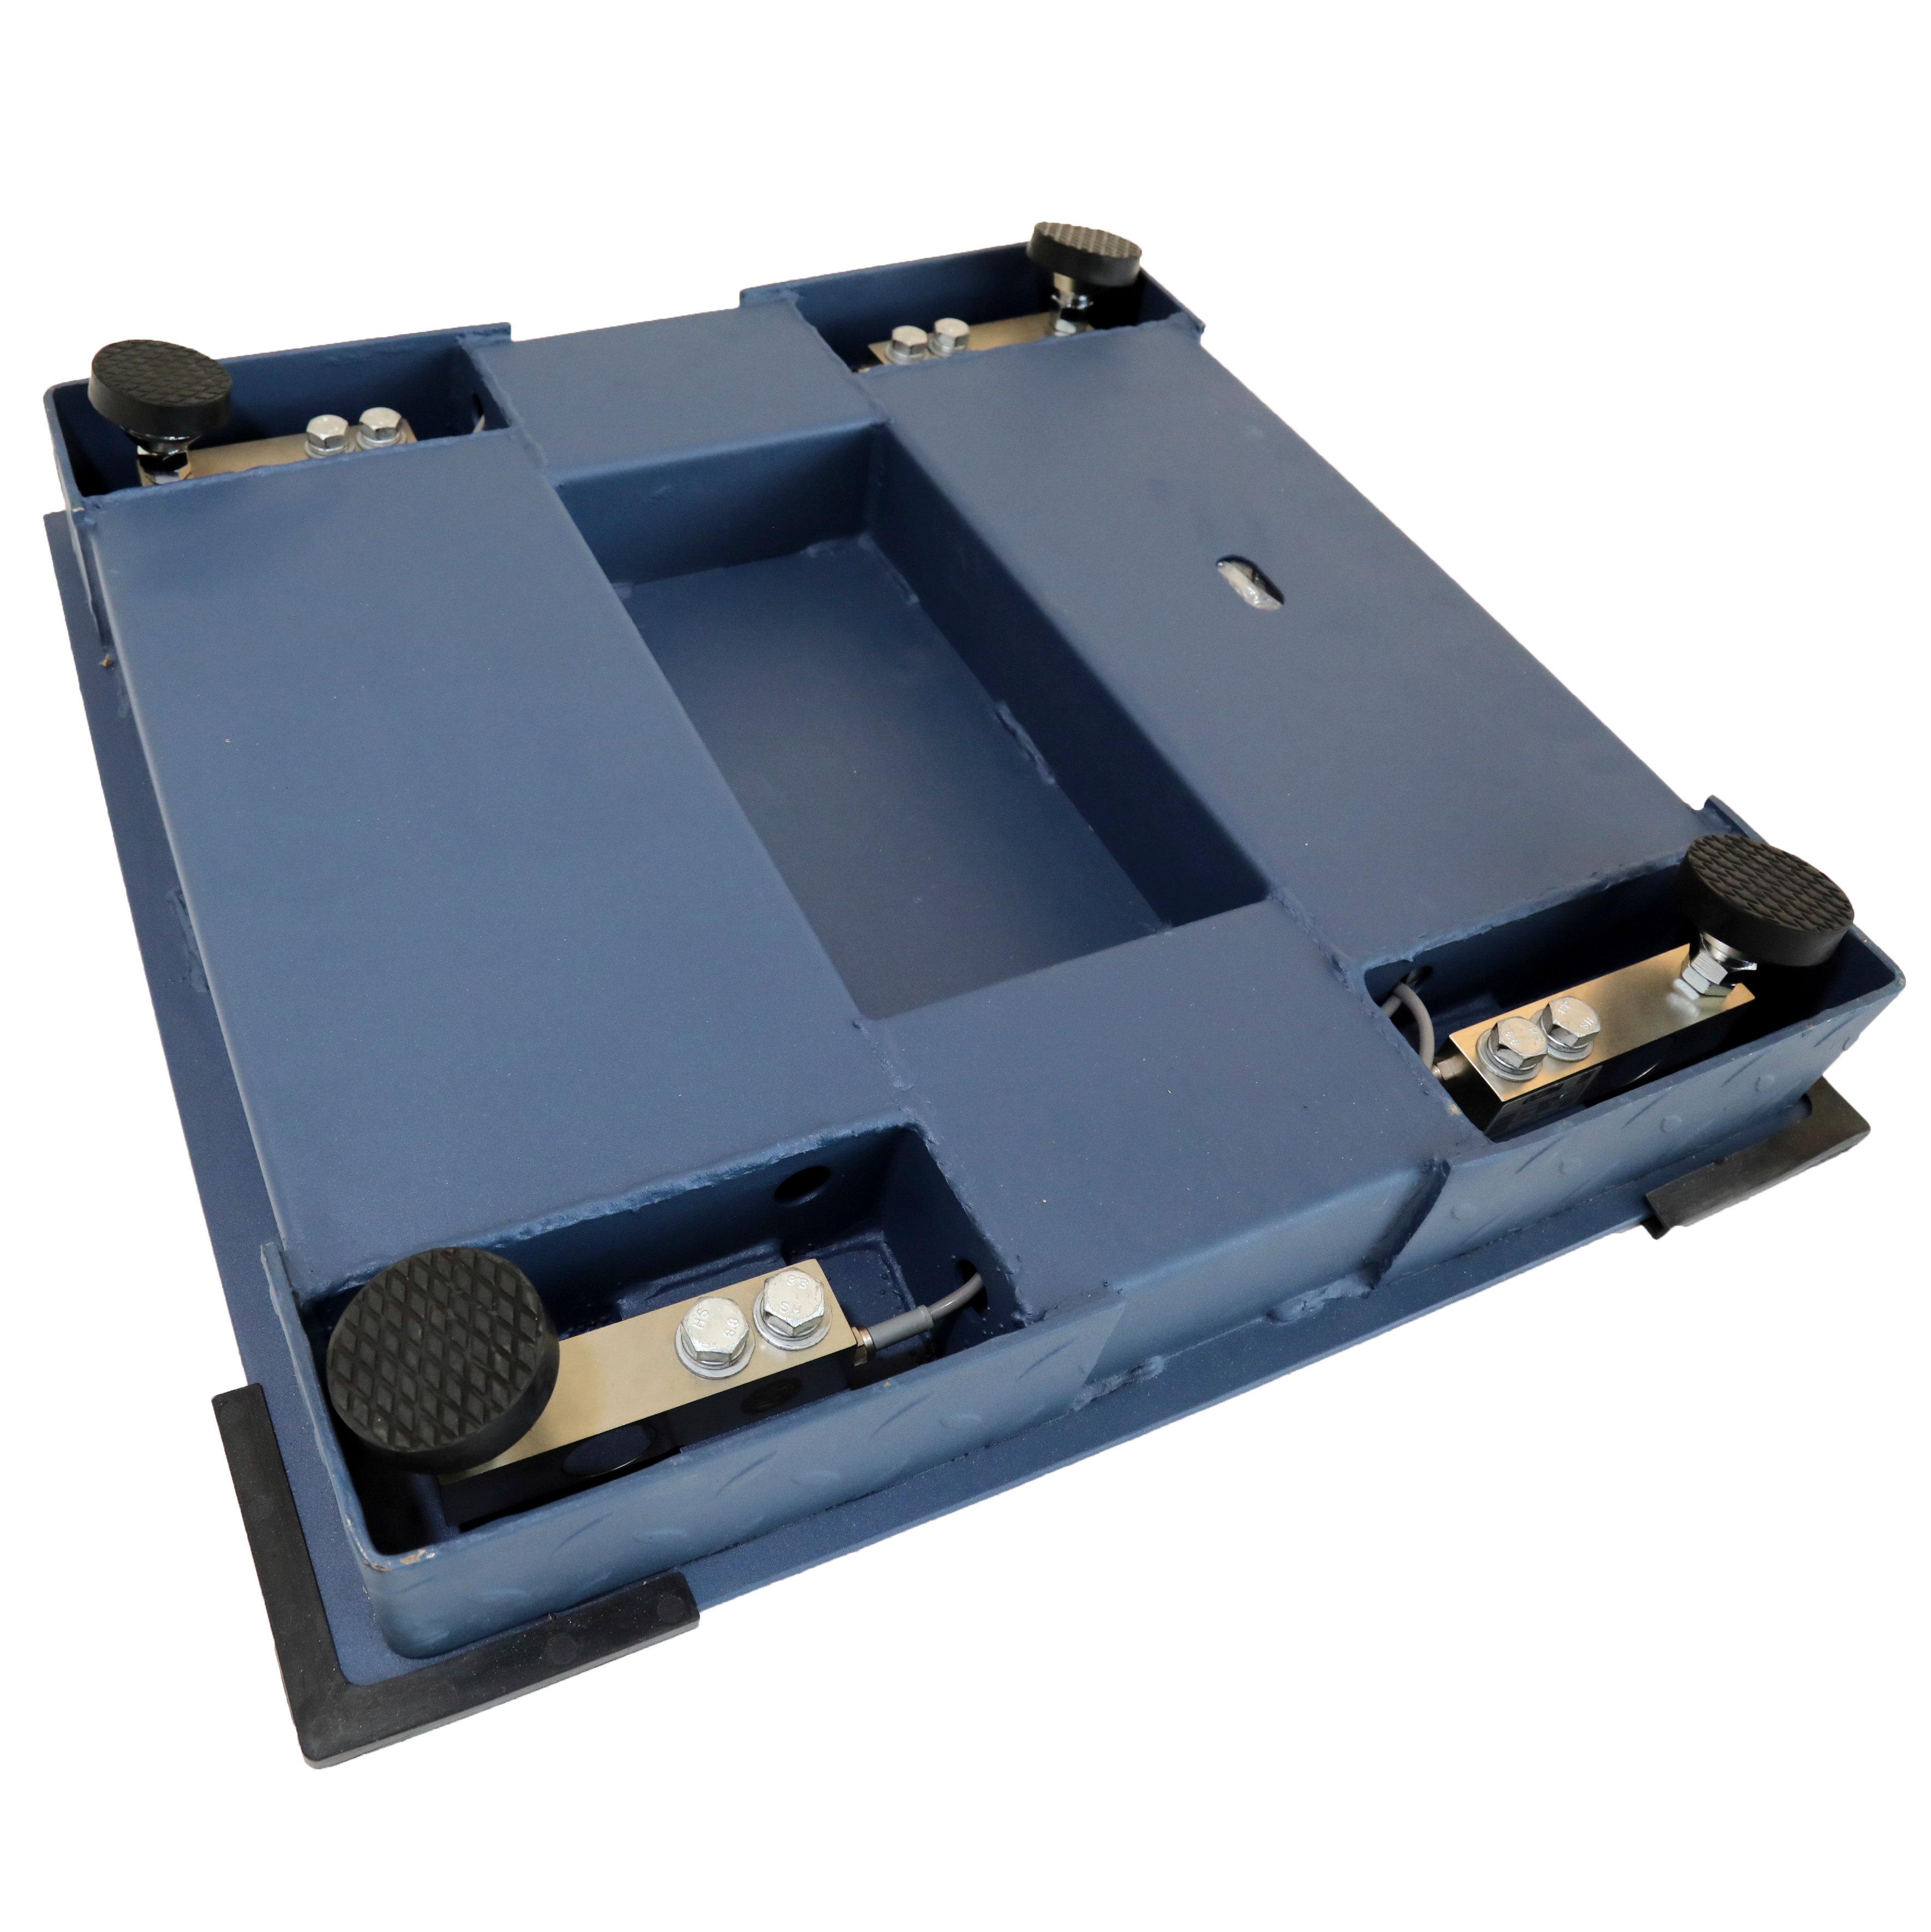 OP-916 NTEP Floor Scale   optimascale